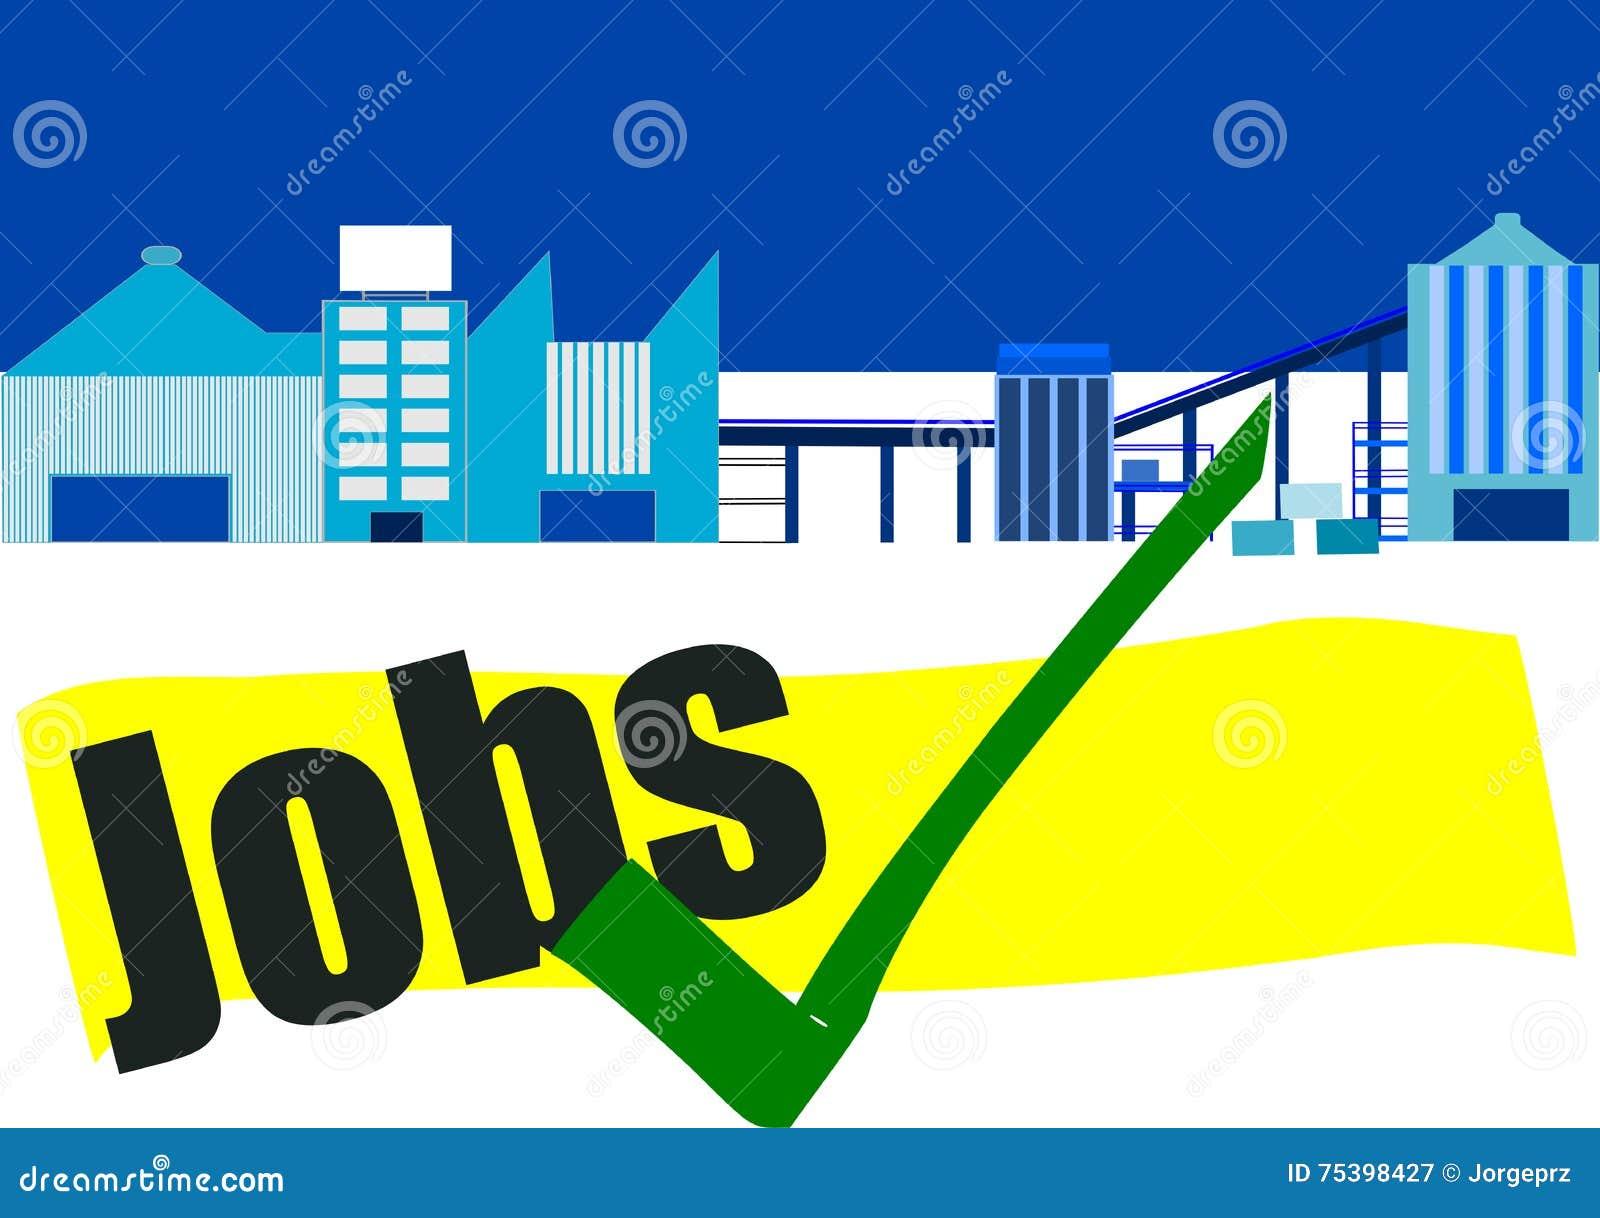 new employment opportunities stock vector image  new employment opportunities